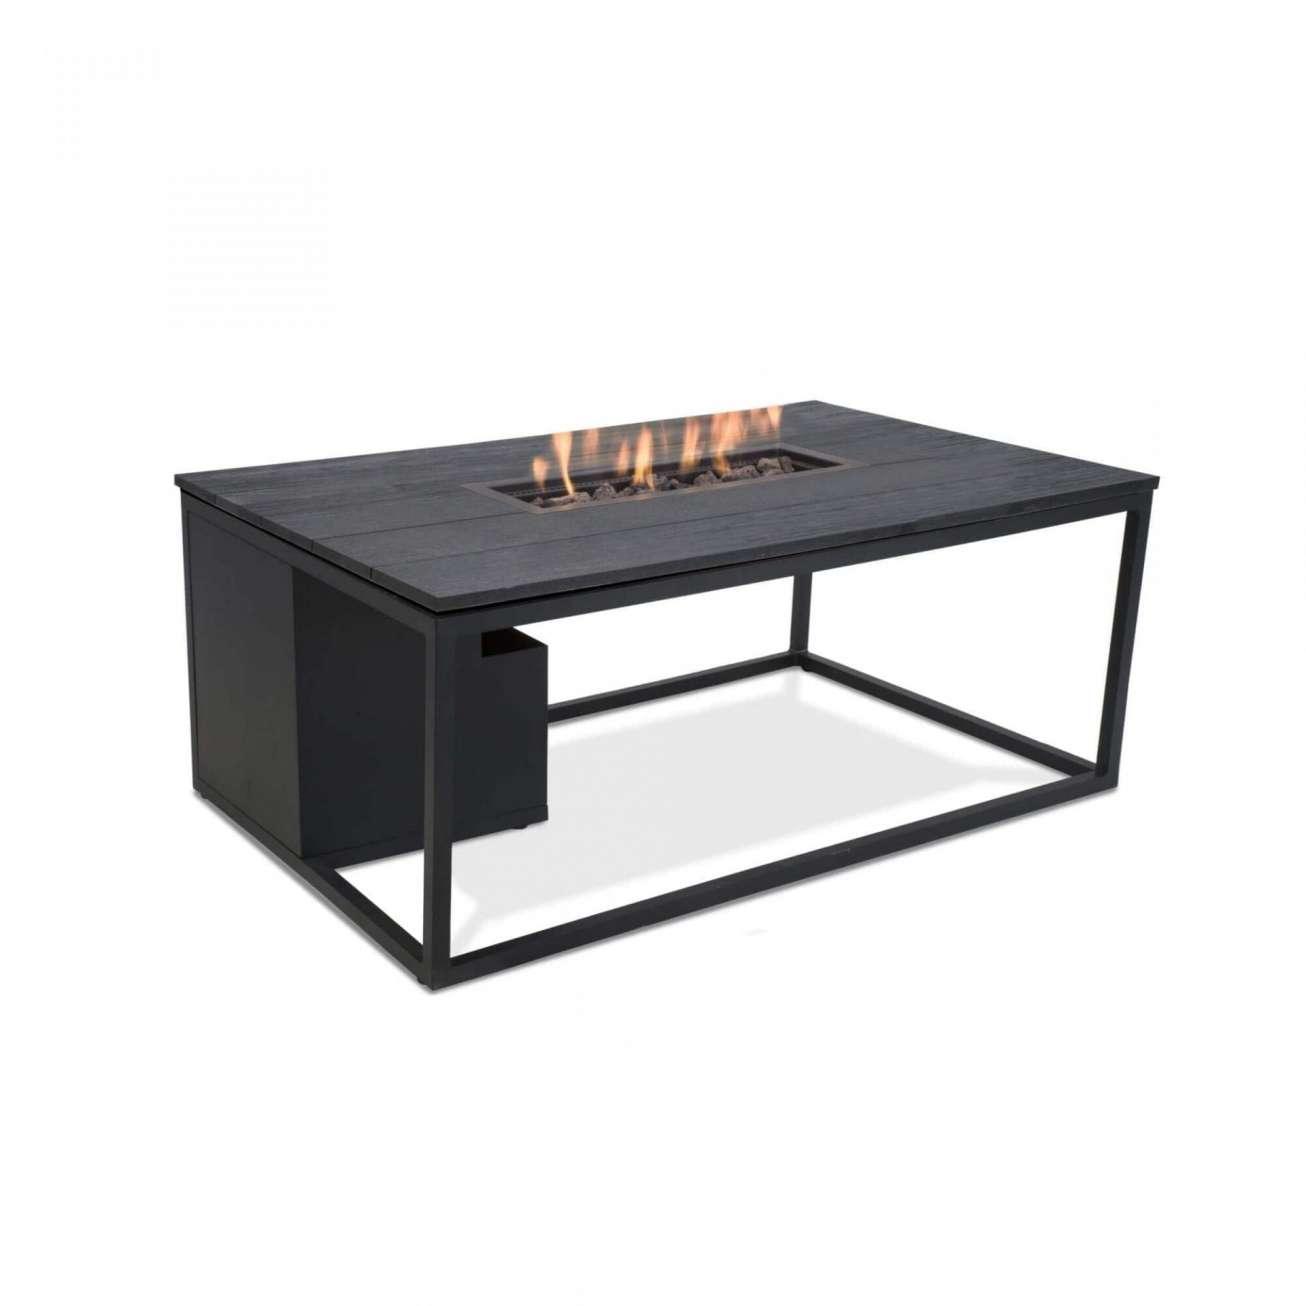 Cosi bord med gasspeis i sort aluminium